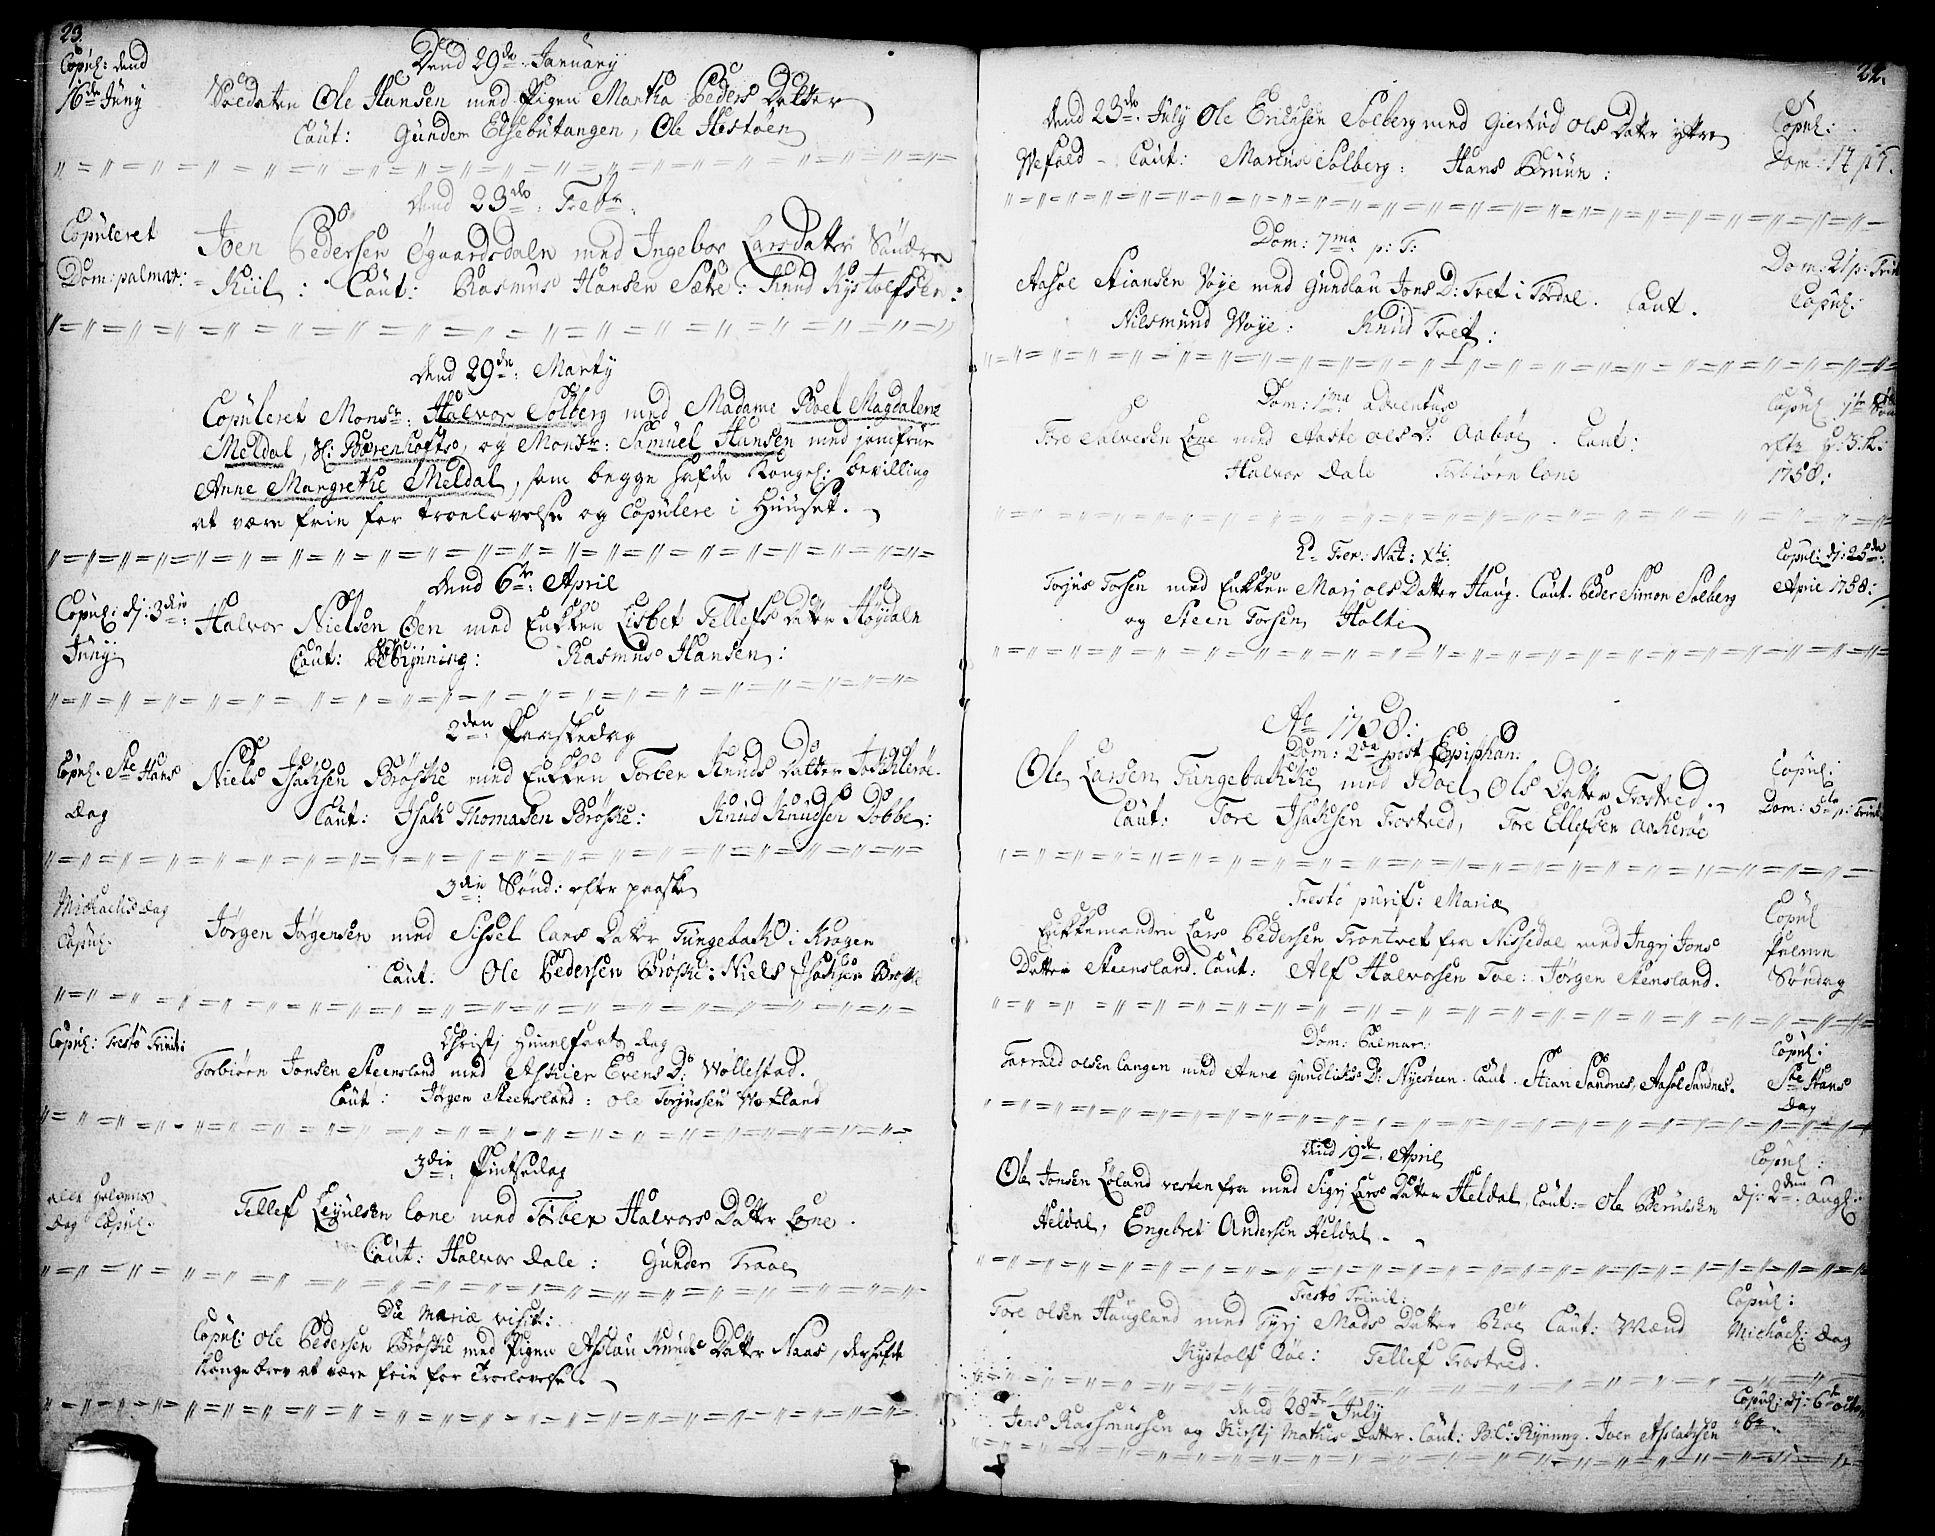 SAKO, Drangedal kirkebøker, F/Fa/L0001: Ministerialbok nr. 1, 1697-1767, s. 23-24